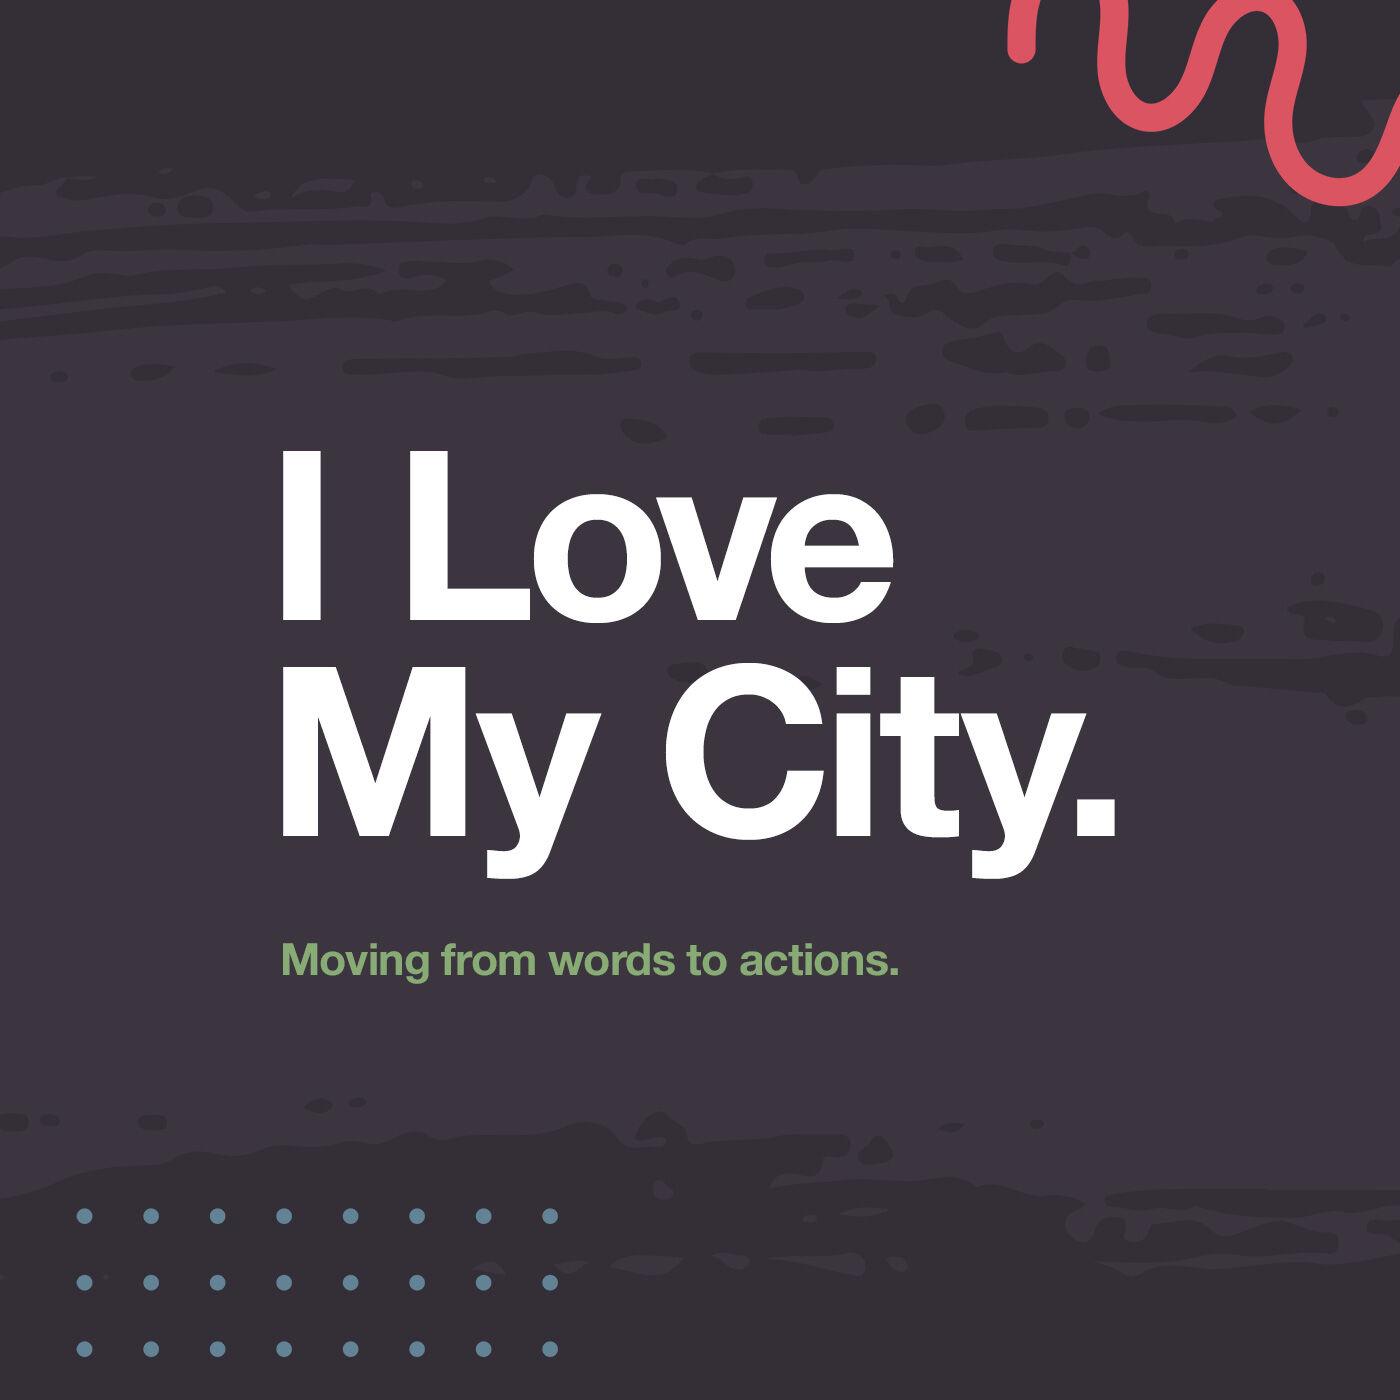 I Love My City 2021, Week 1